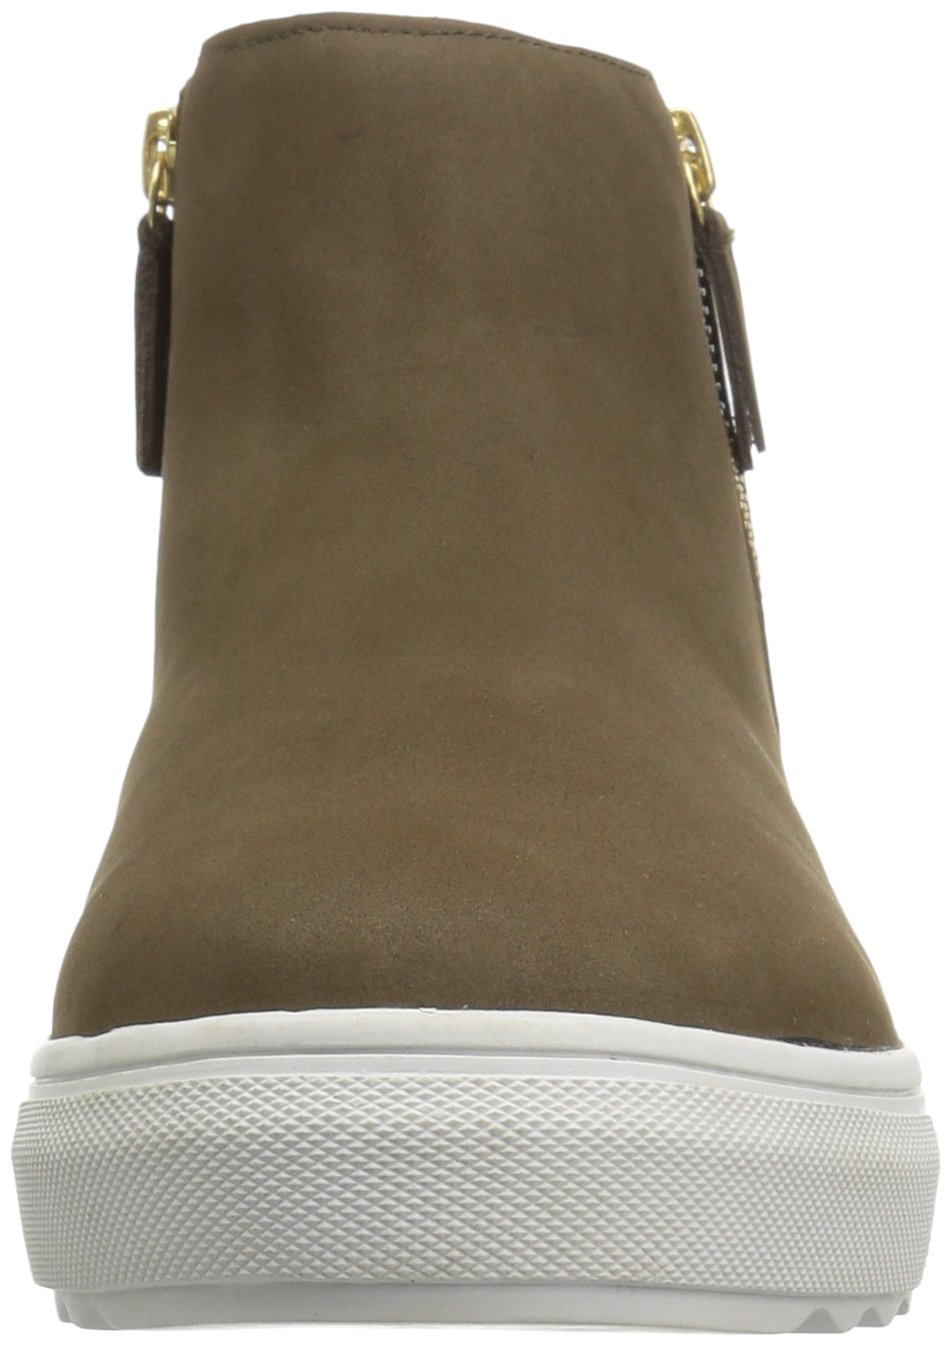 J Slides Women's Poppy Ankle Boot B074QQHTGQ 6 B(M) US Khaki